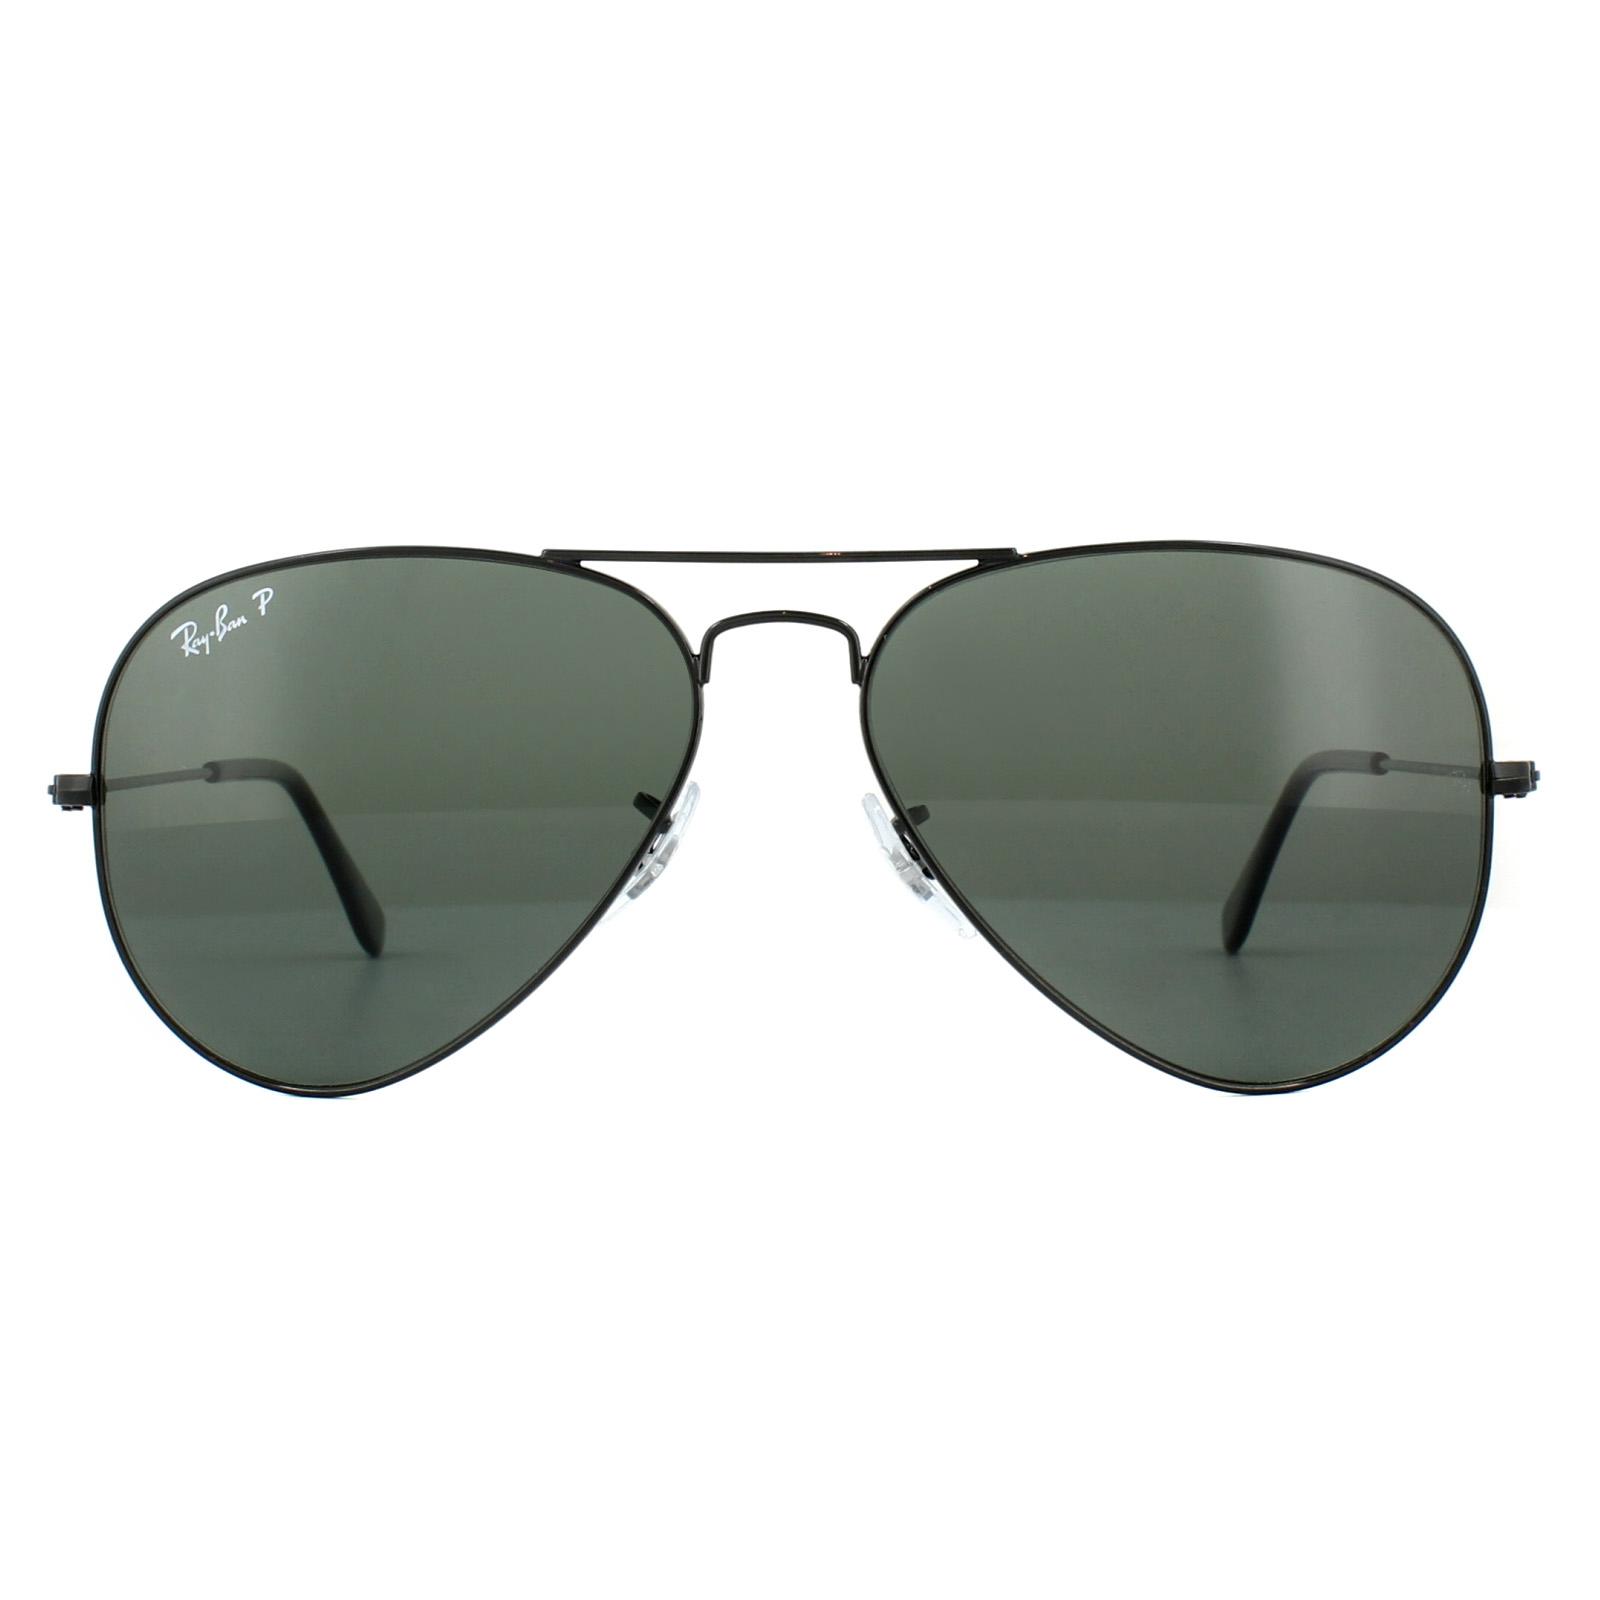 14bf28454d Sentinel Ray-Ban Sunglasses Aviator 3025 002 58 Black Green Polarized  Medium 58mm